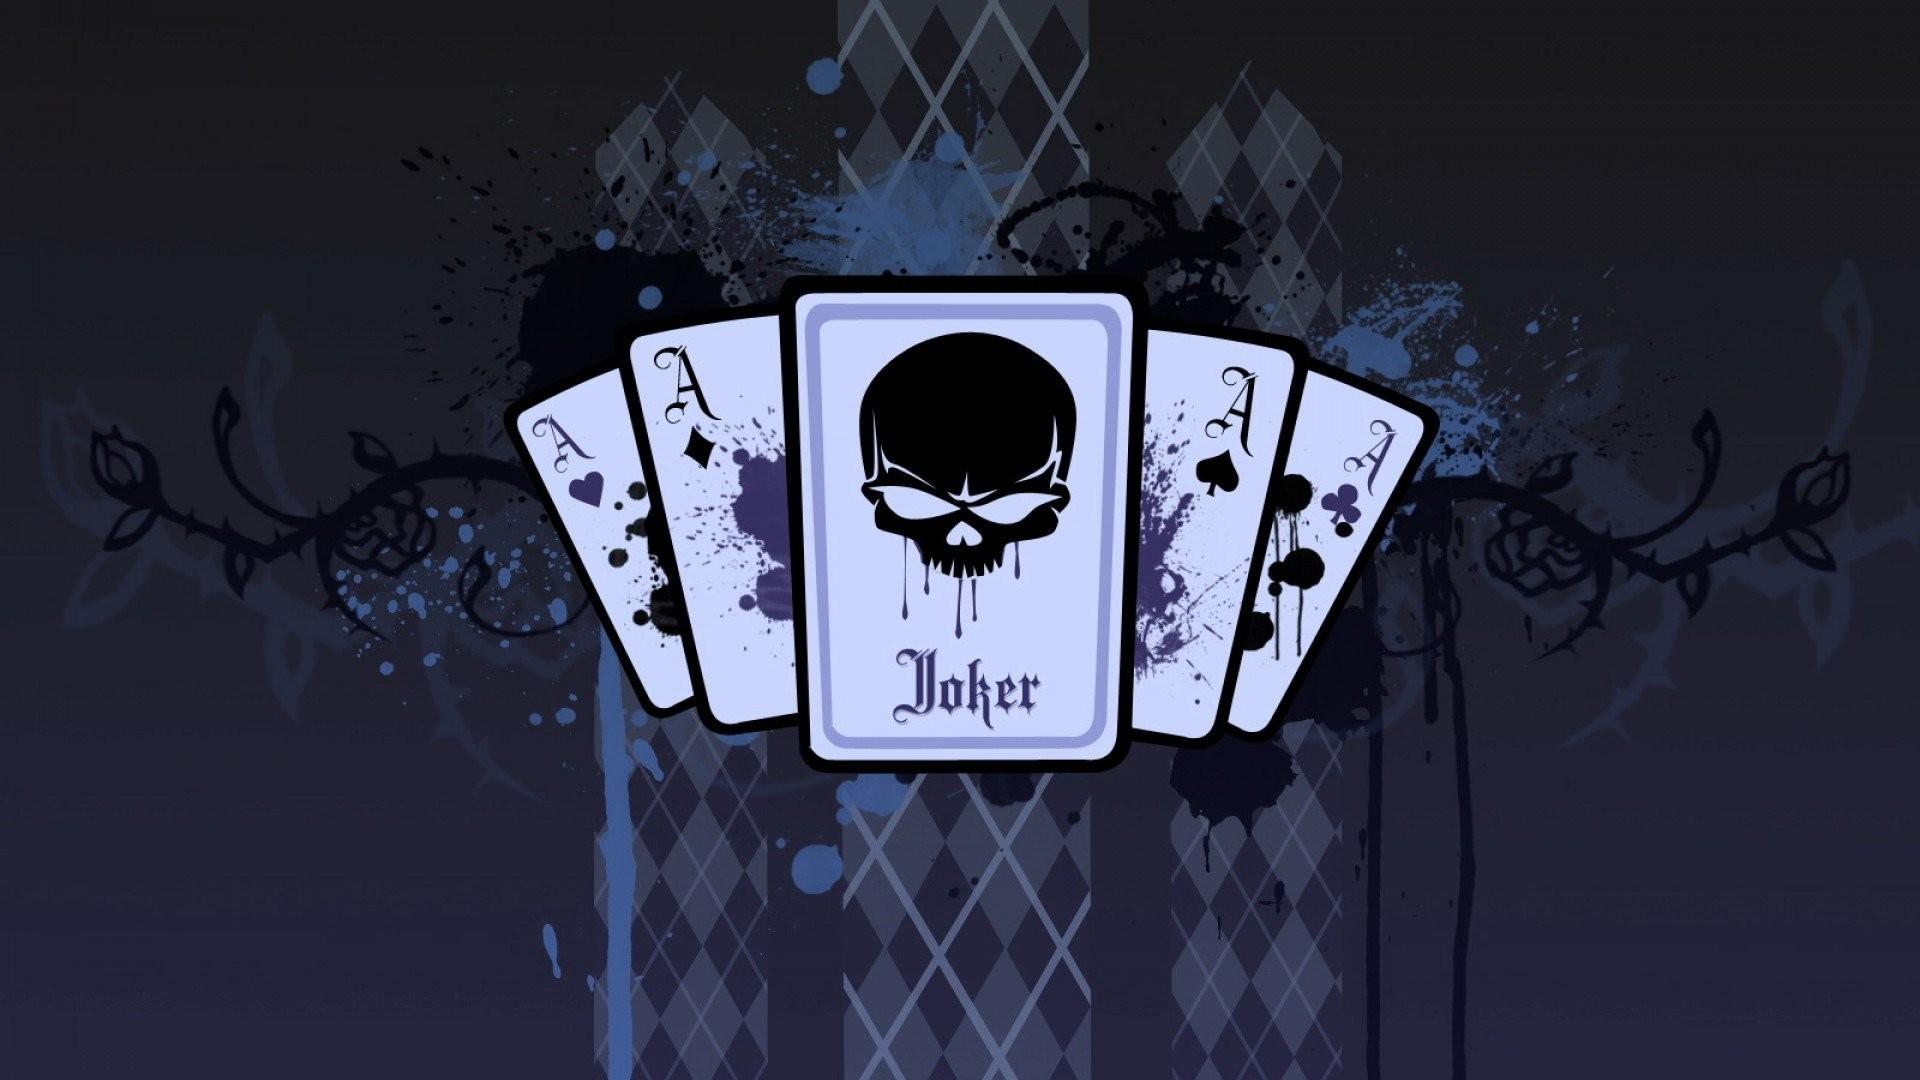 Joker HD Wallpaper – Android Apps on Google Play